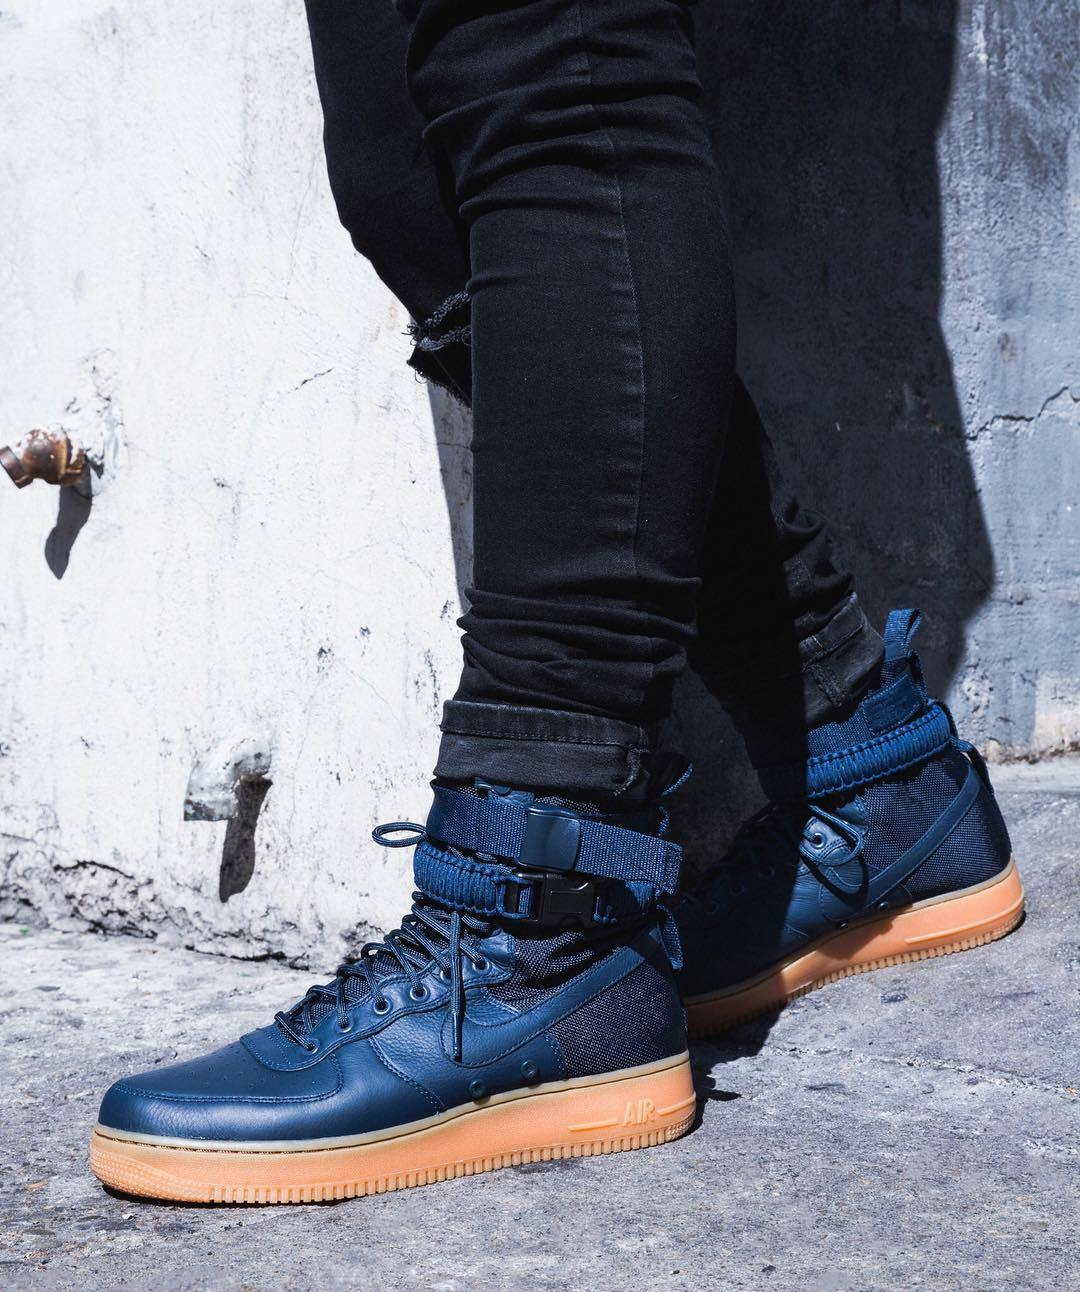 Nike SF Air 1 Hi GIOCO Force Royal blu Suede Uomo Scarpe da Ginnastica Stivali 864024